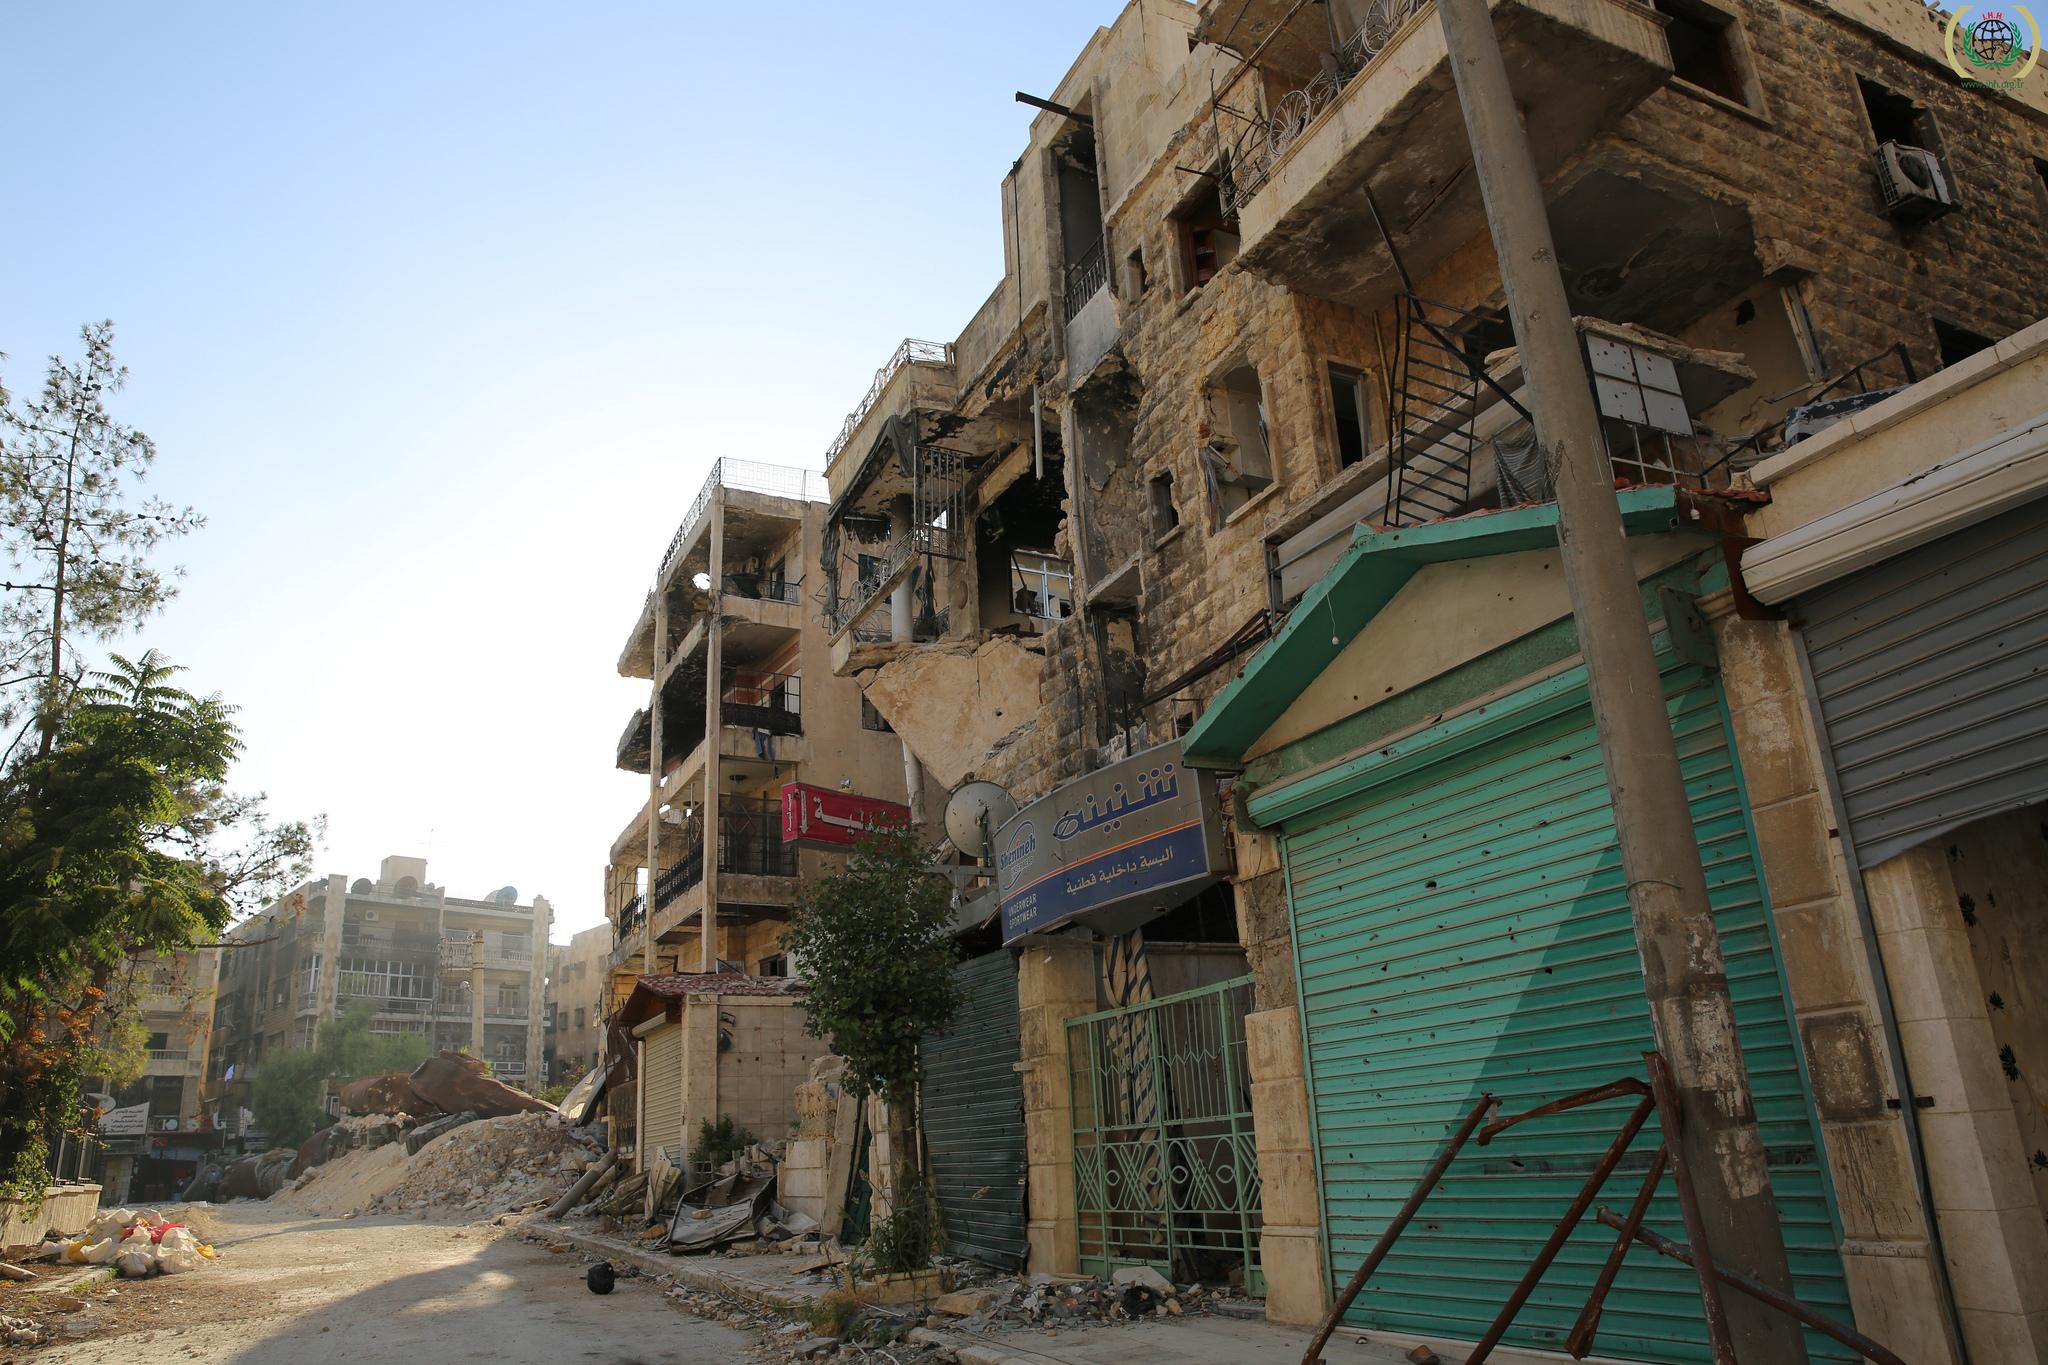 Aleppo, Syrien